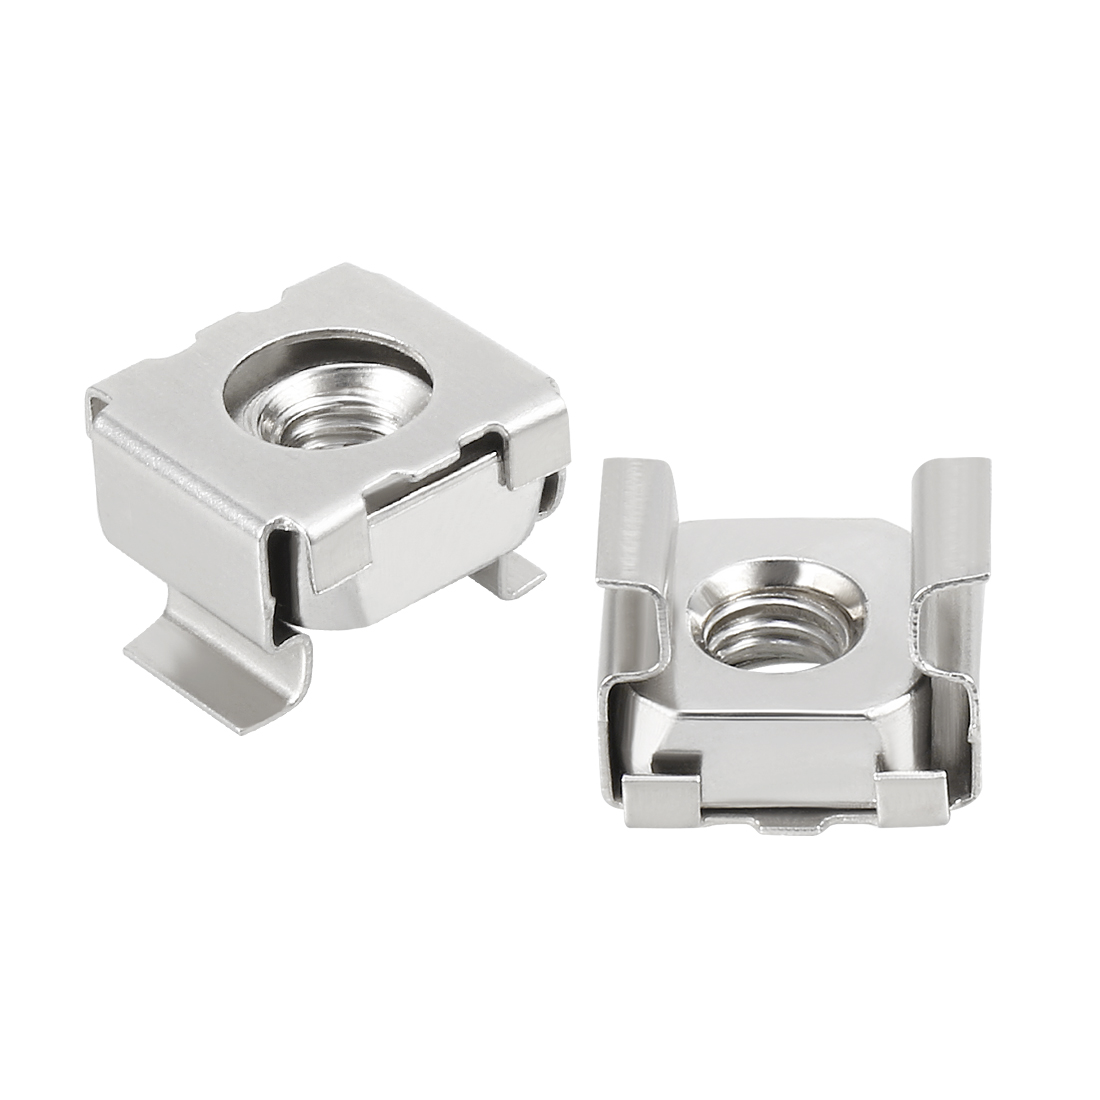 Unique Bargains 35pcs Carbon Steel Nickel Plated M4 Cage Nut for Server Shelf Cabinet - image 4 de 4